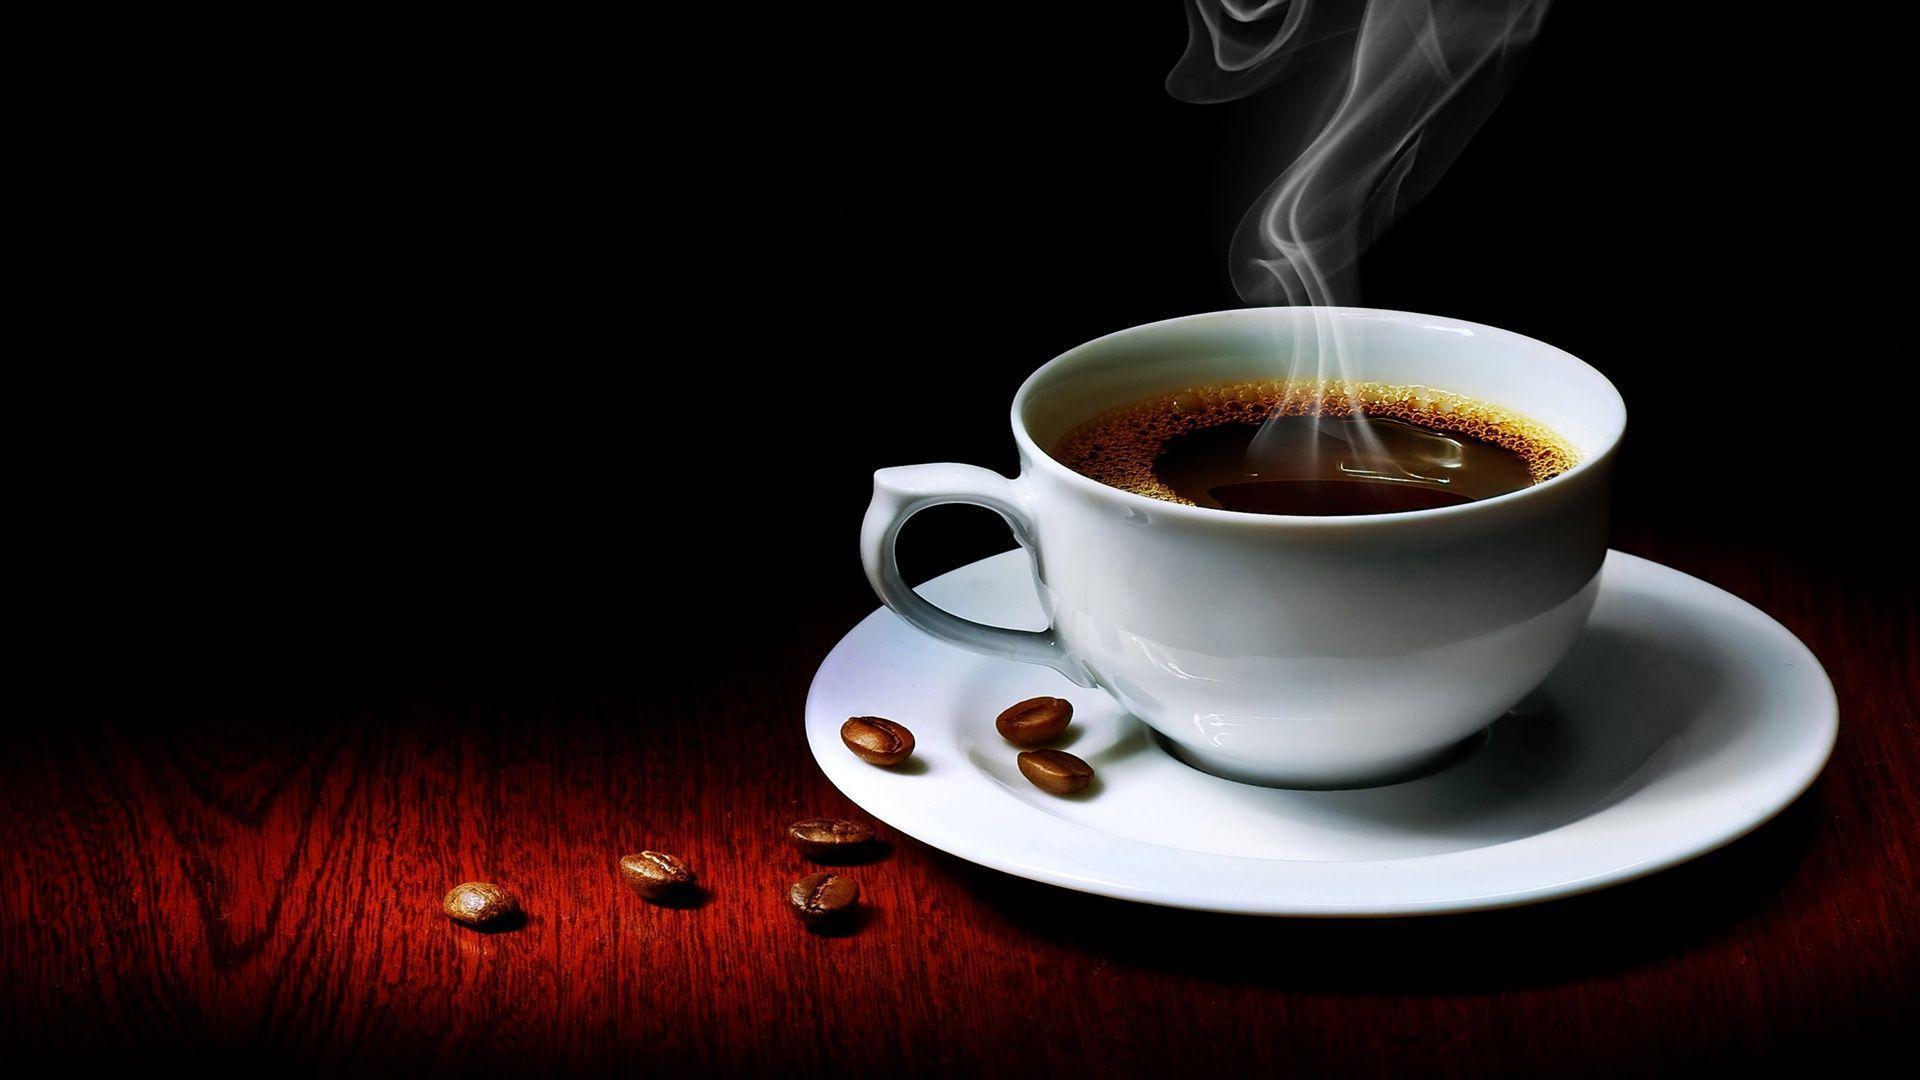 HD Coffee Wallpaper - WallpaperSafari